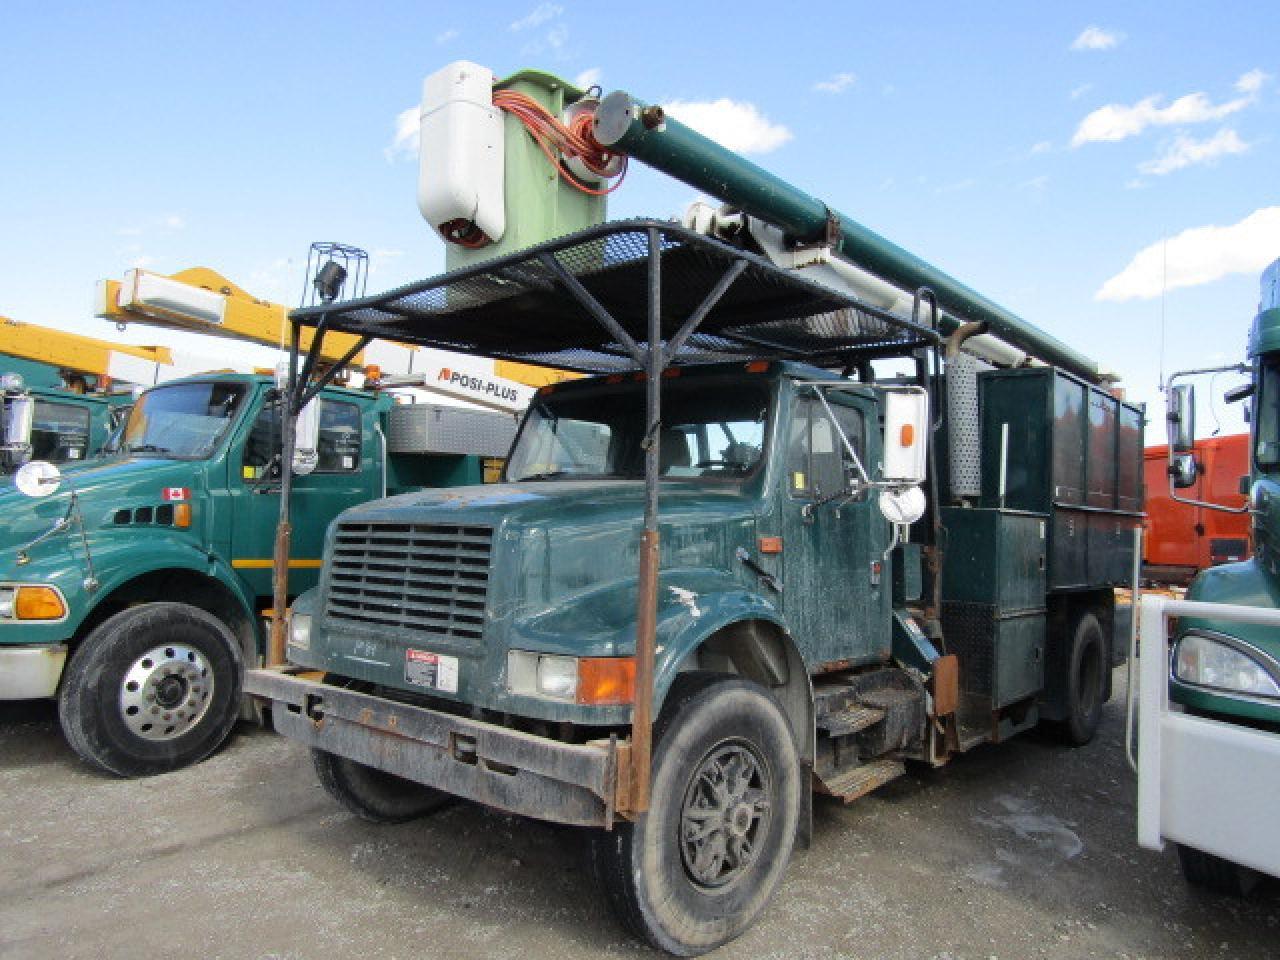 Photo of Green 1991 International 4000 SERIES 4900